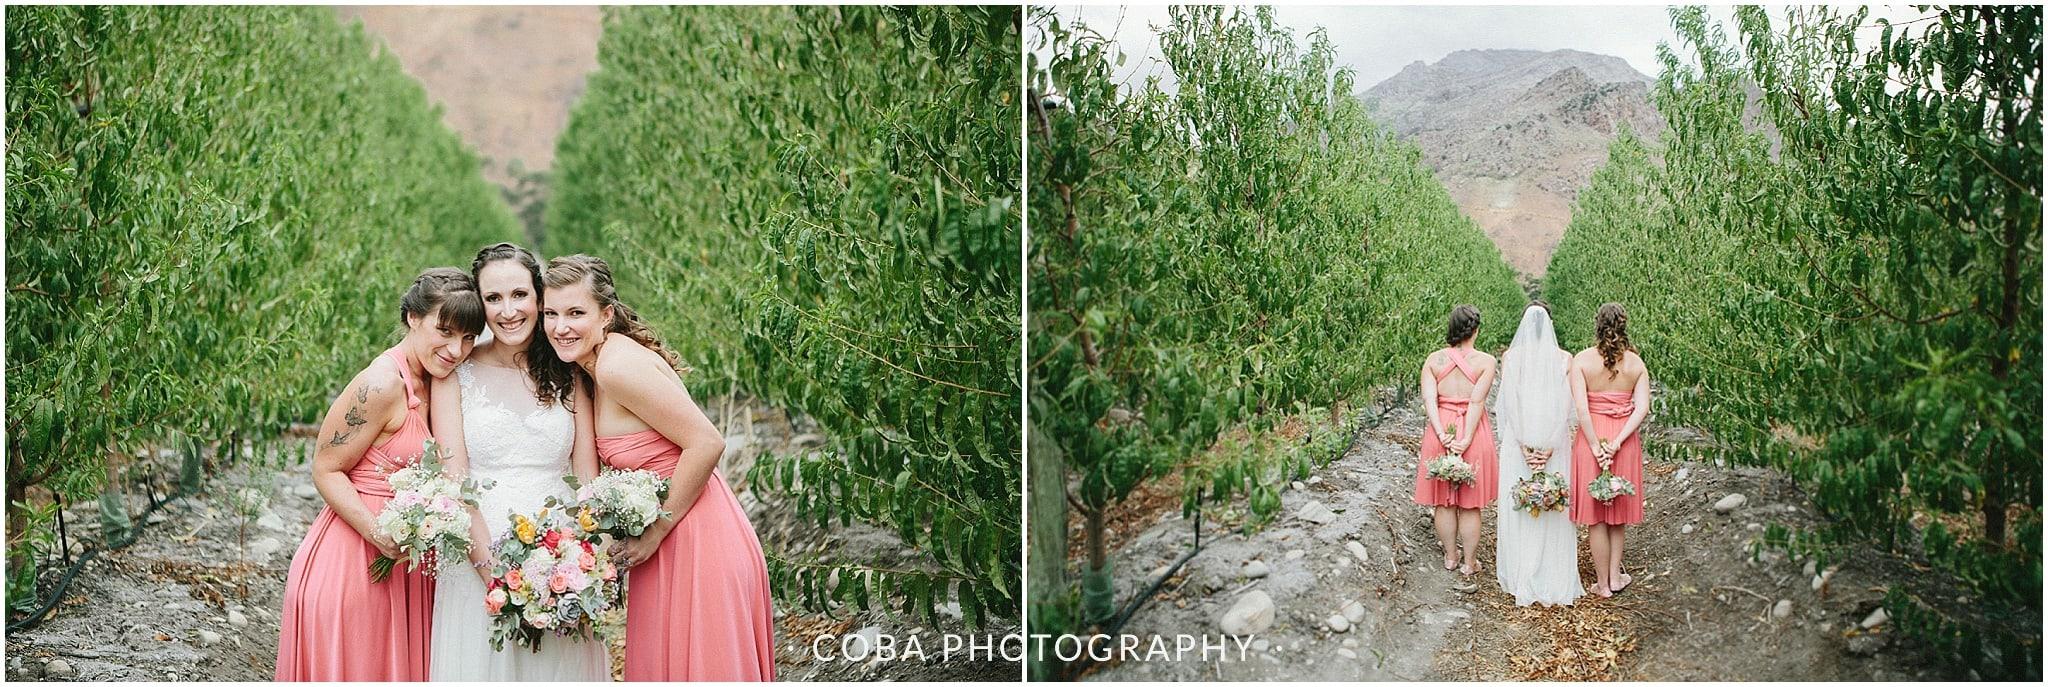 John&Pad - Olive Rock - Coba Photography (107)